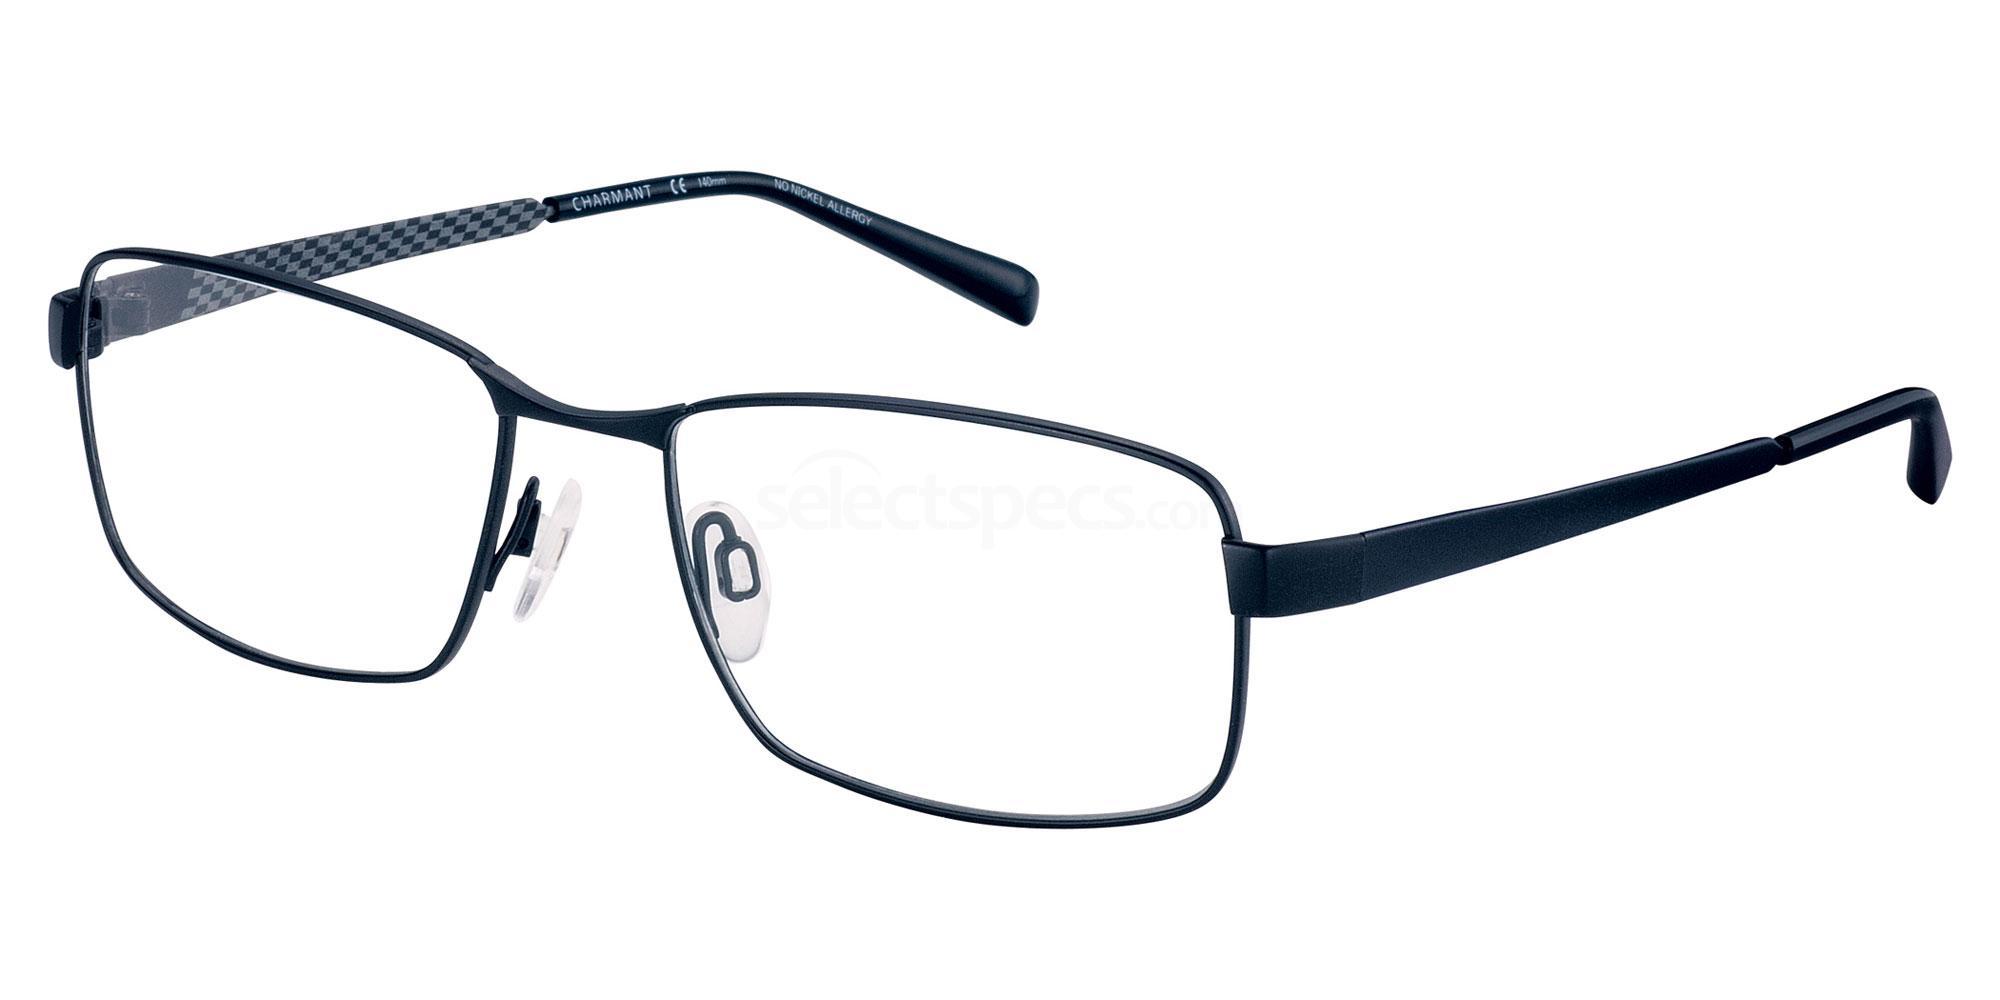 BK CH11438 Glasses, Charmant Titanium Perfection